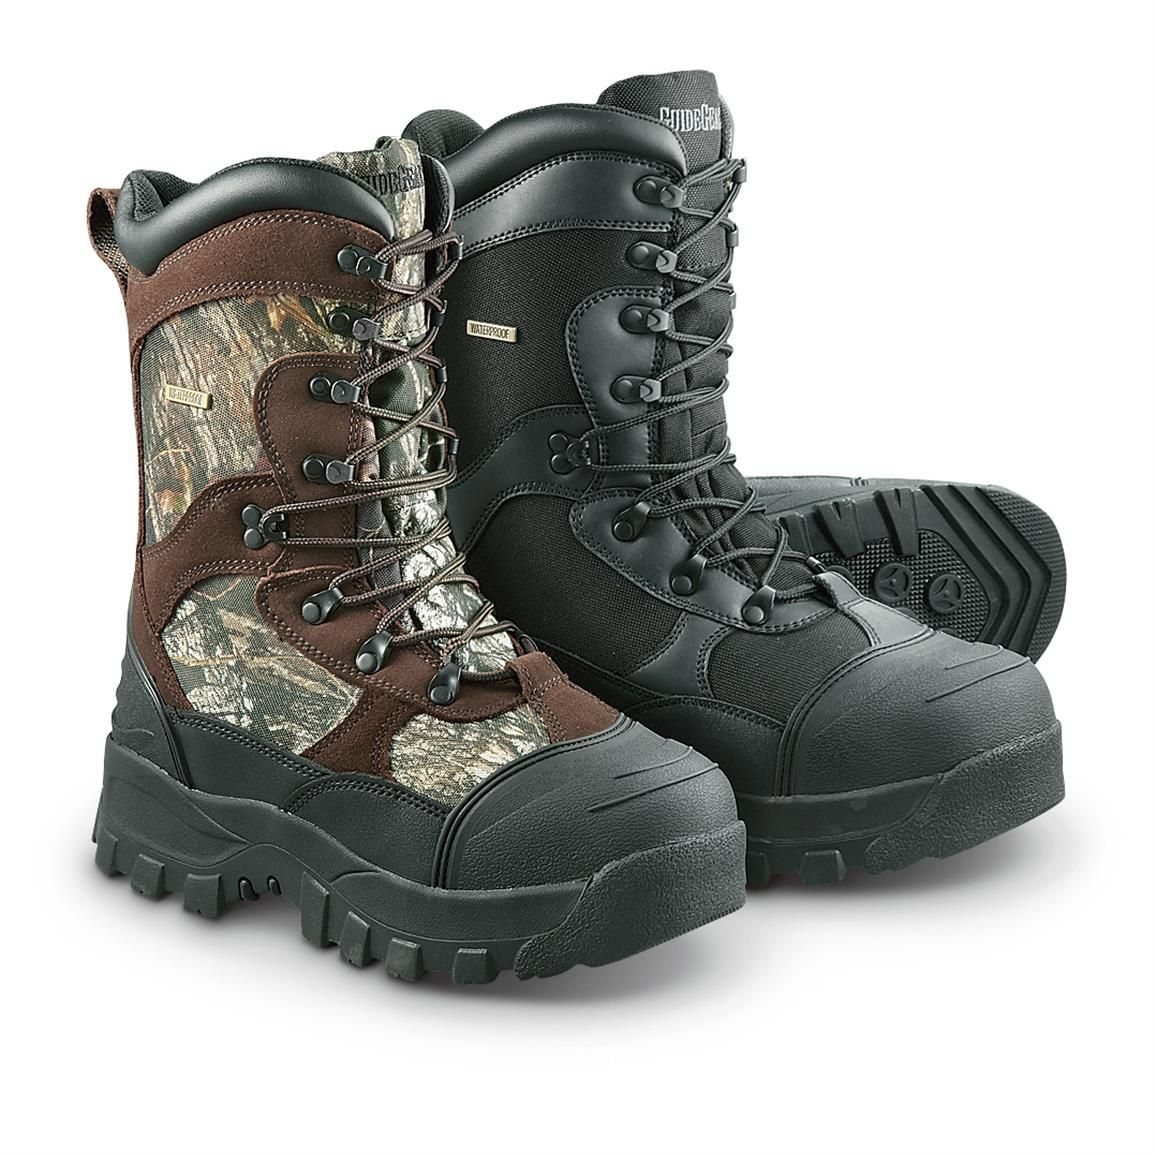 6b8d2a7e186 Guide Gear Men's Insulated Hunting Boots, Waterproof, 2,400 Gram ...